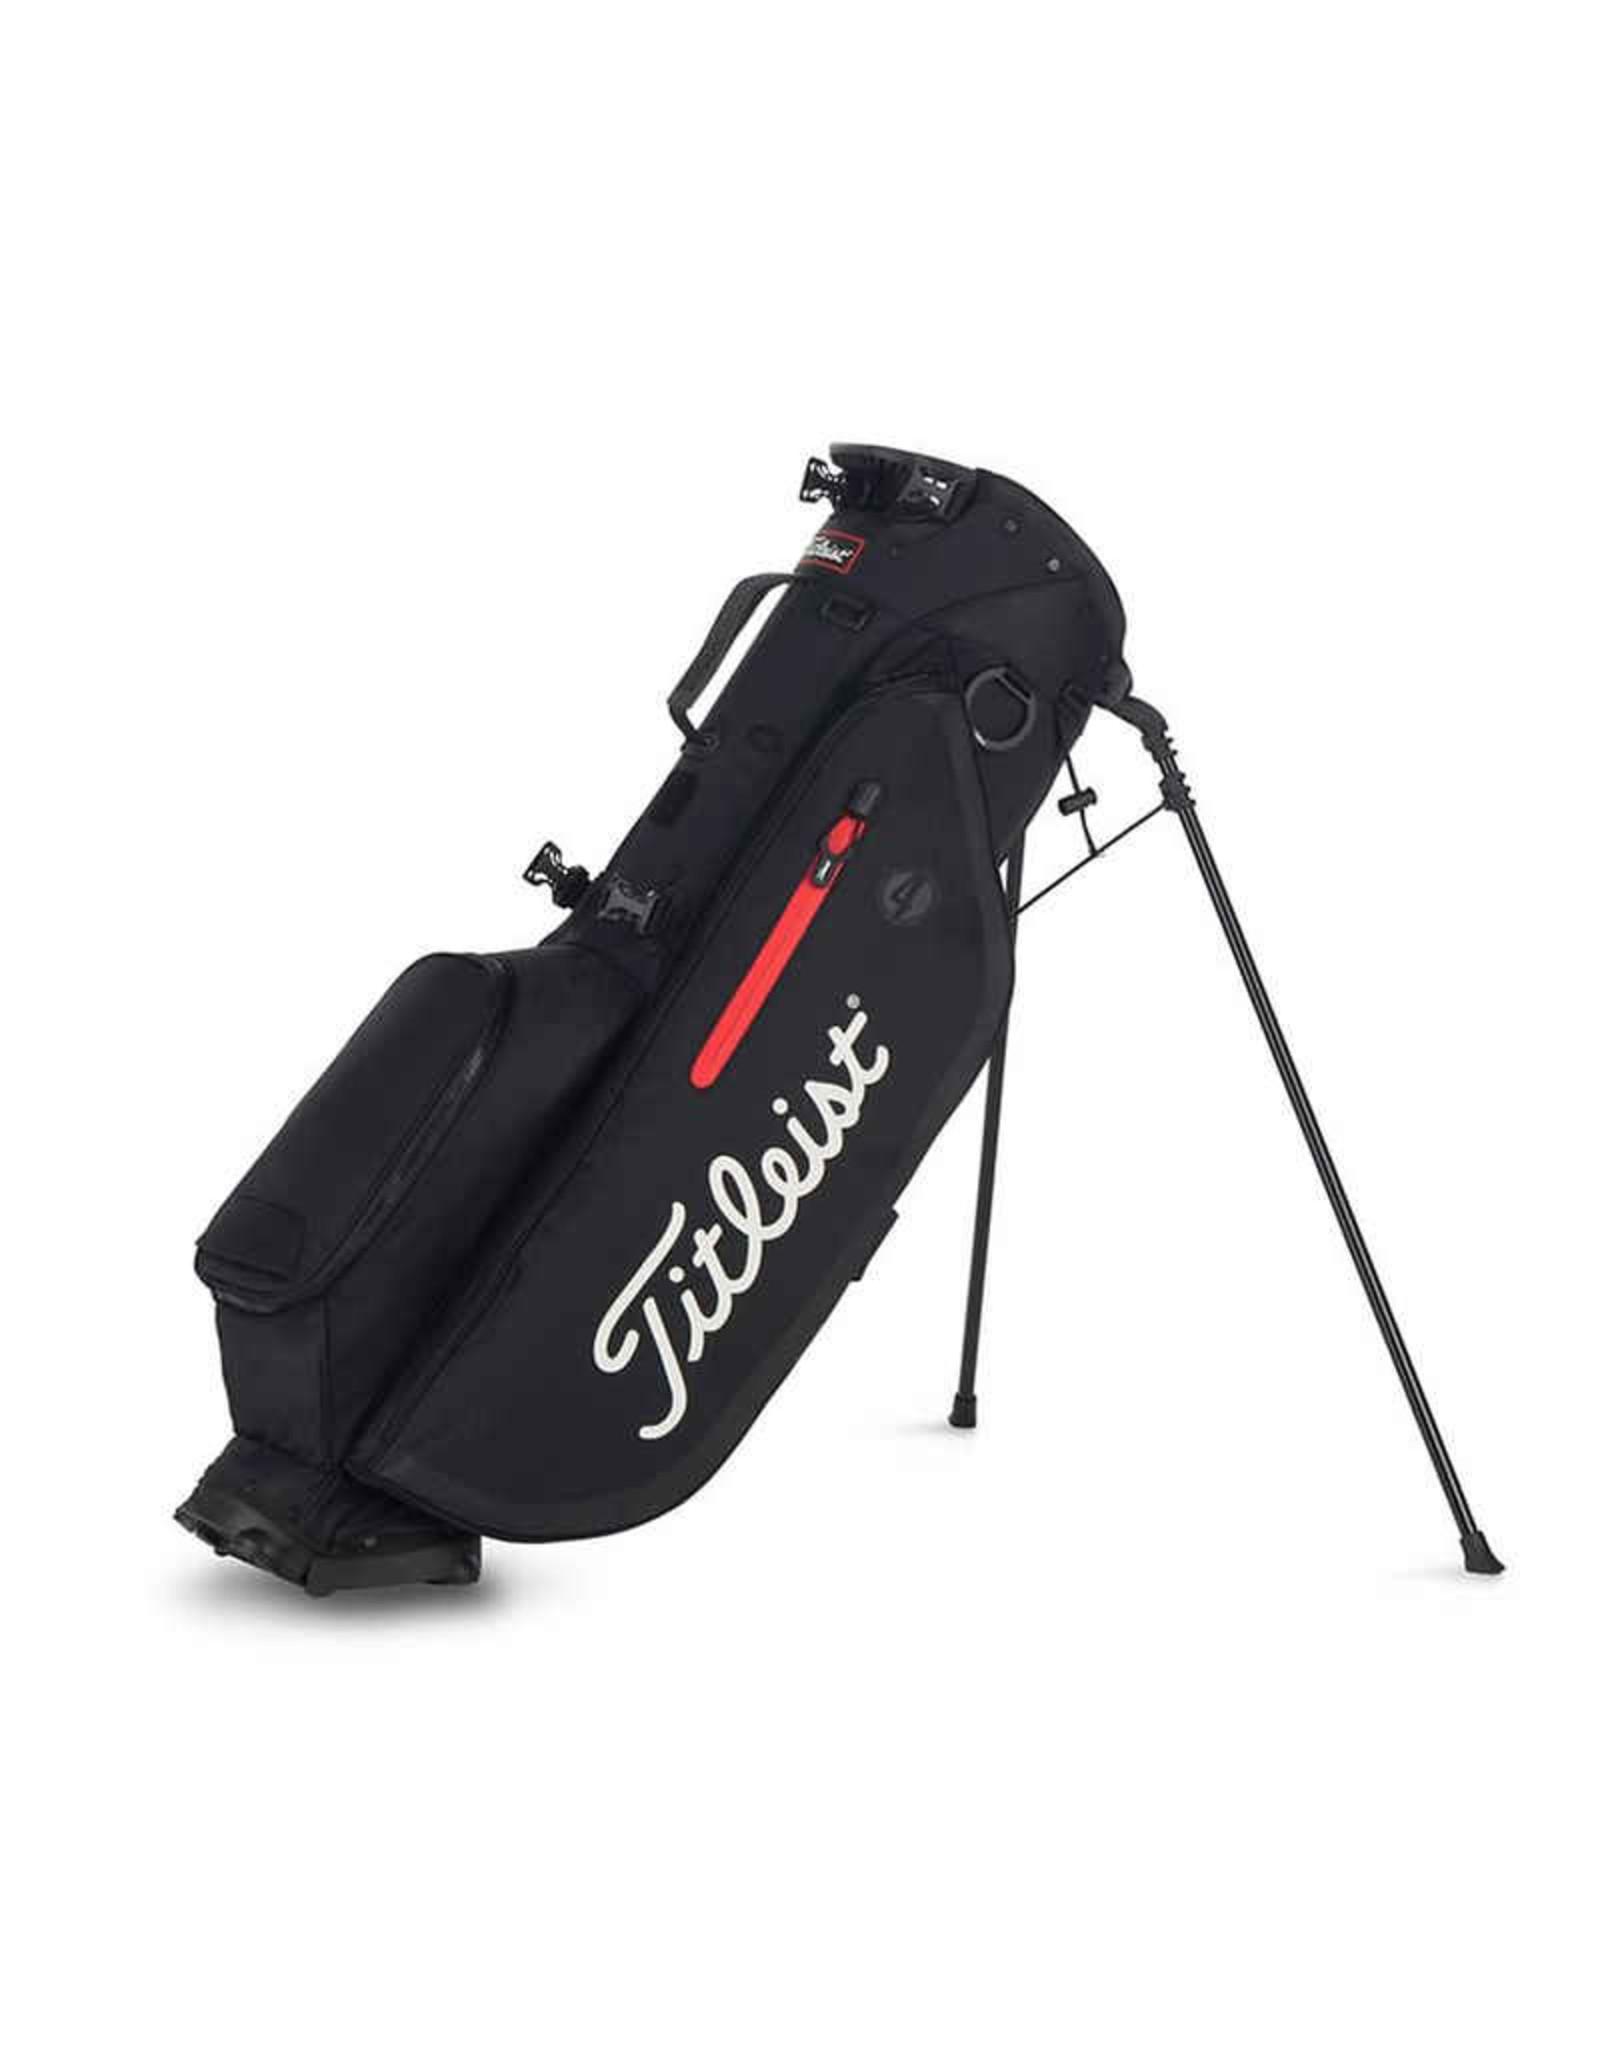 Titleist Titleist Players 4 Stand Bags